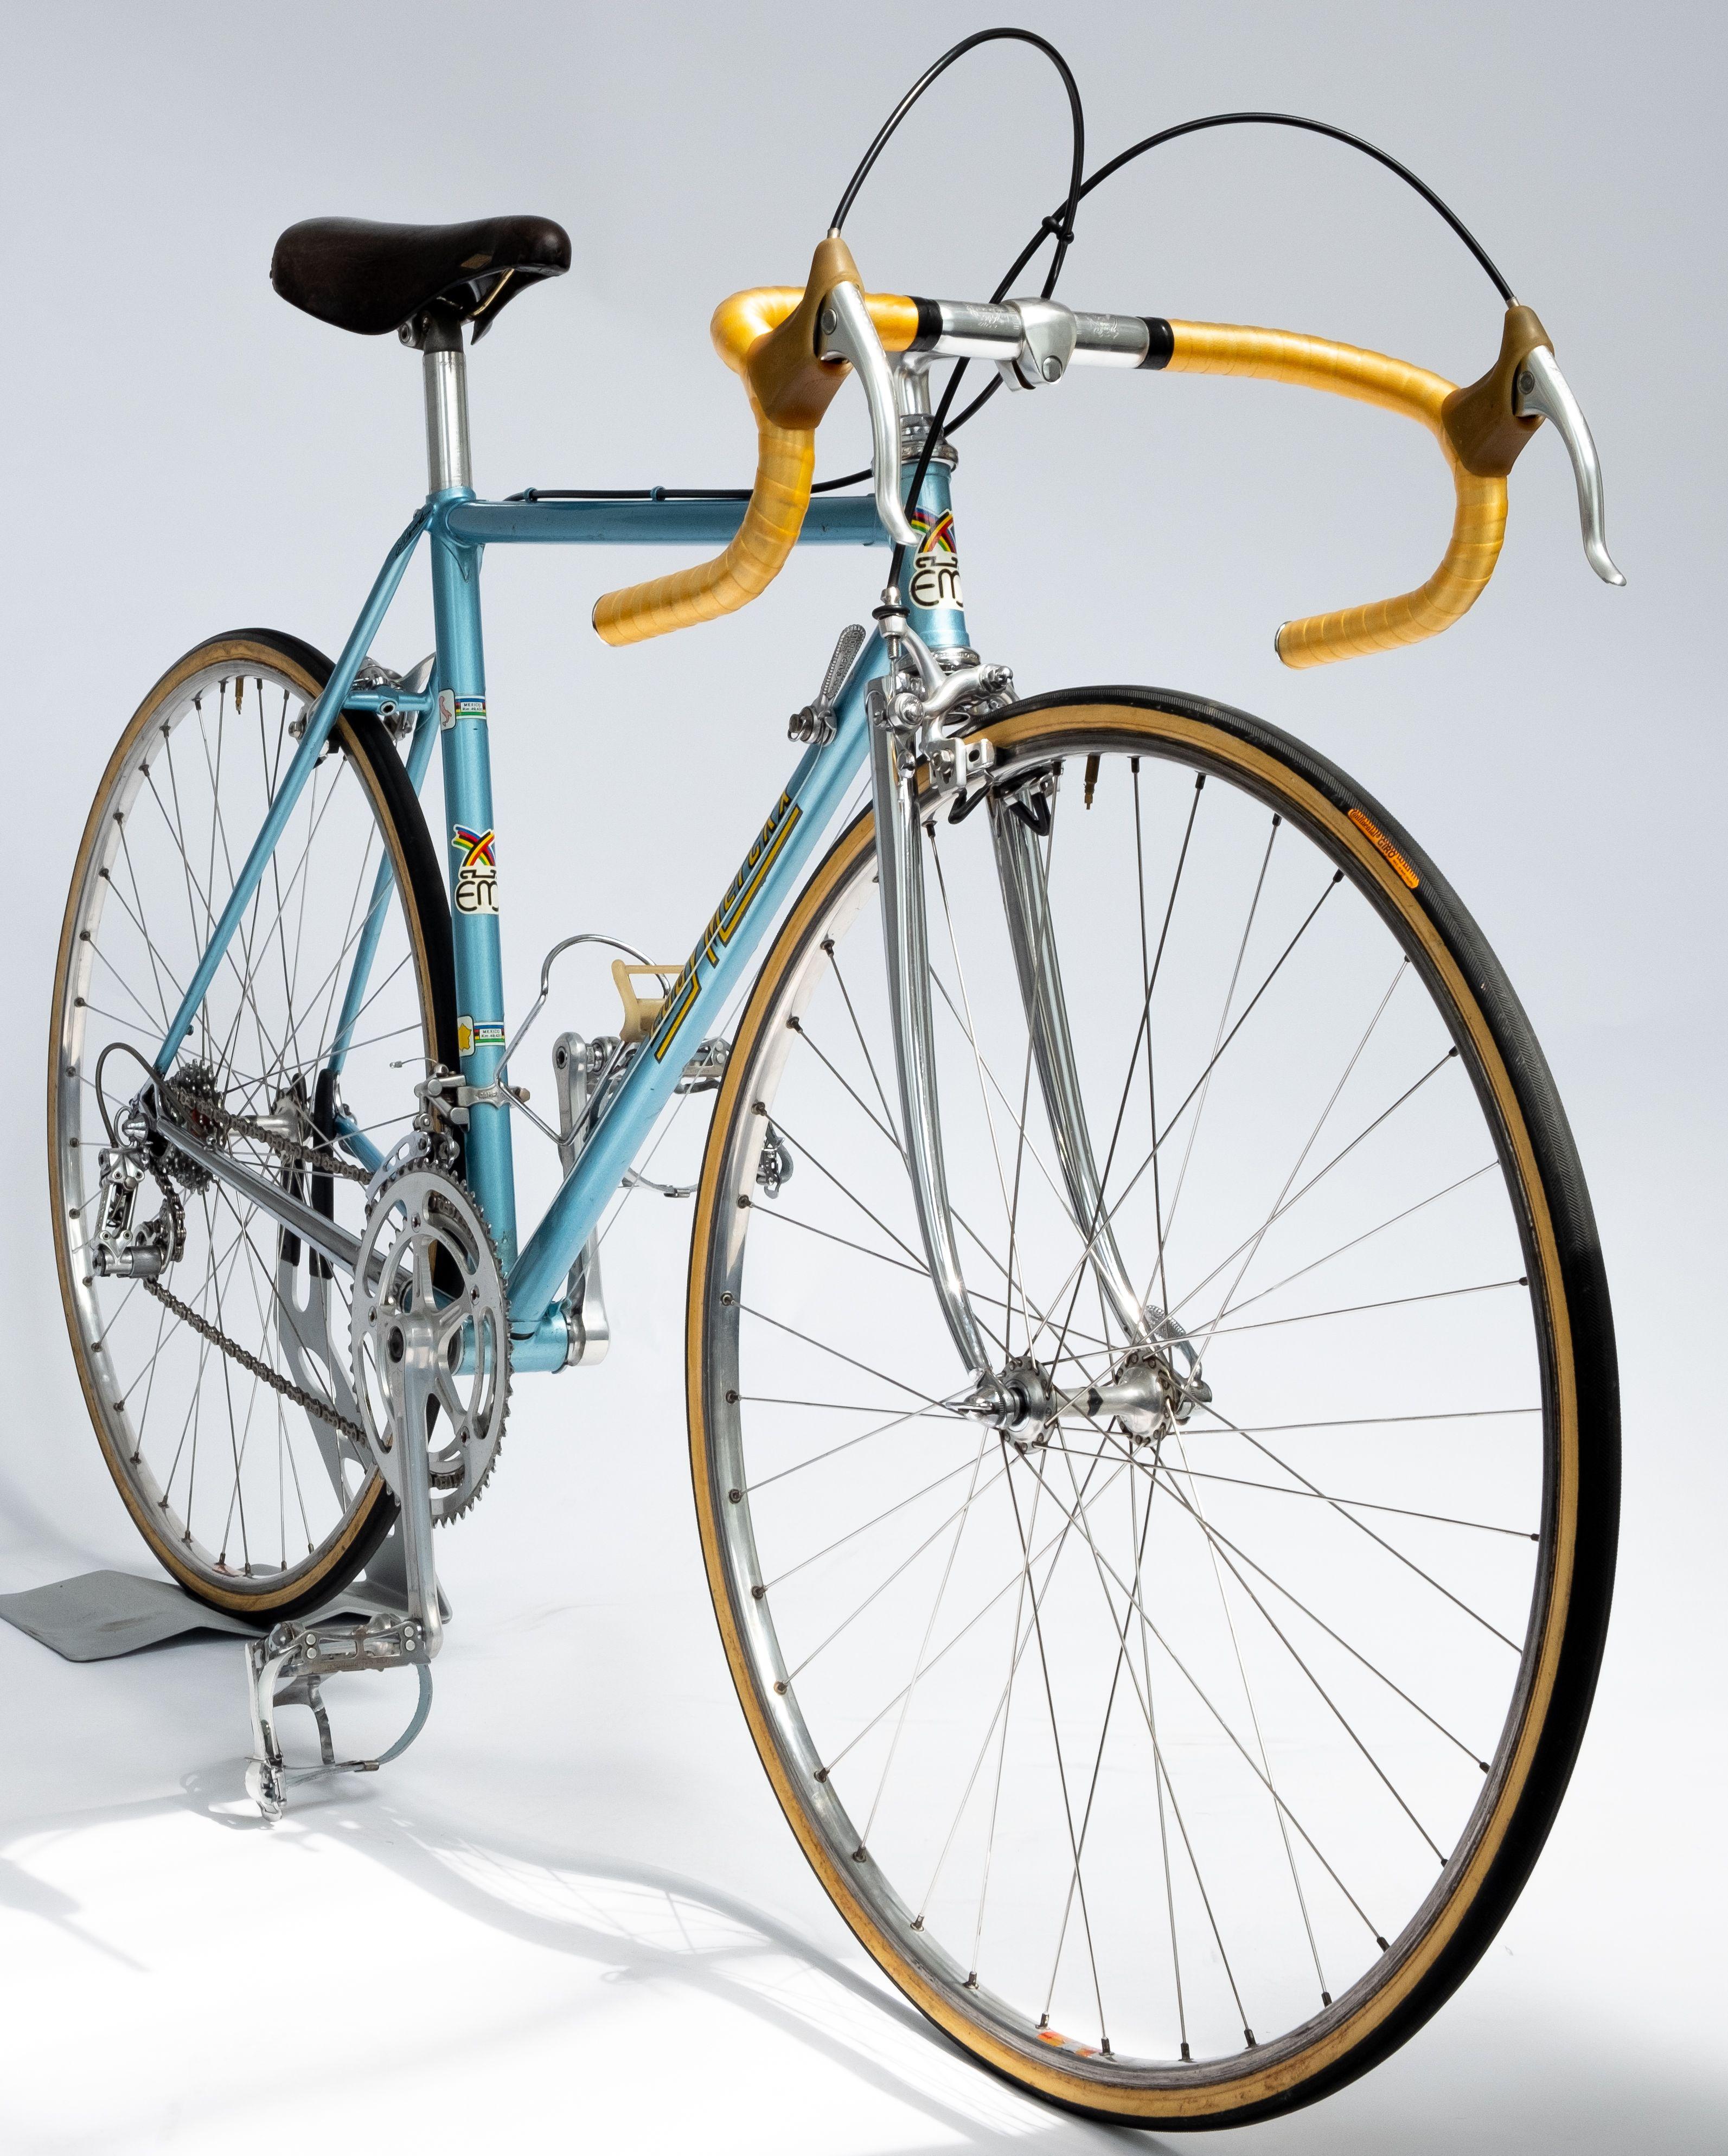 dbe80687181 Vintage Eddy Merckx Professional Signature Bike (De-Rosa Built) 50cm  Campagnolo